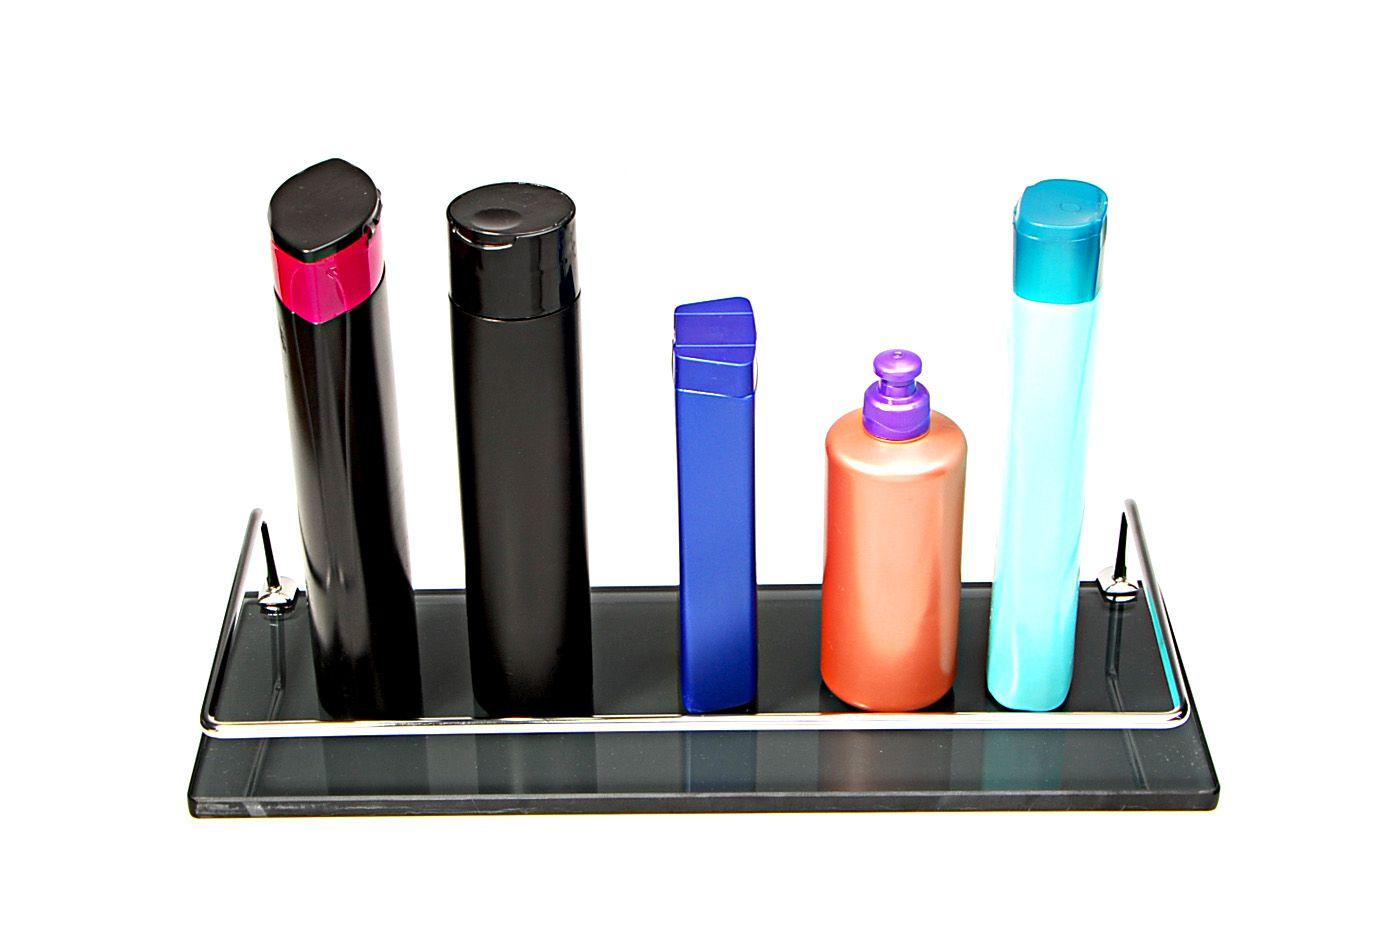 Porta Shampoo Reto em Vidro Fumê Lapidado - Aquabox  - 40cmx14cmx10mm